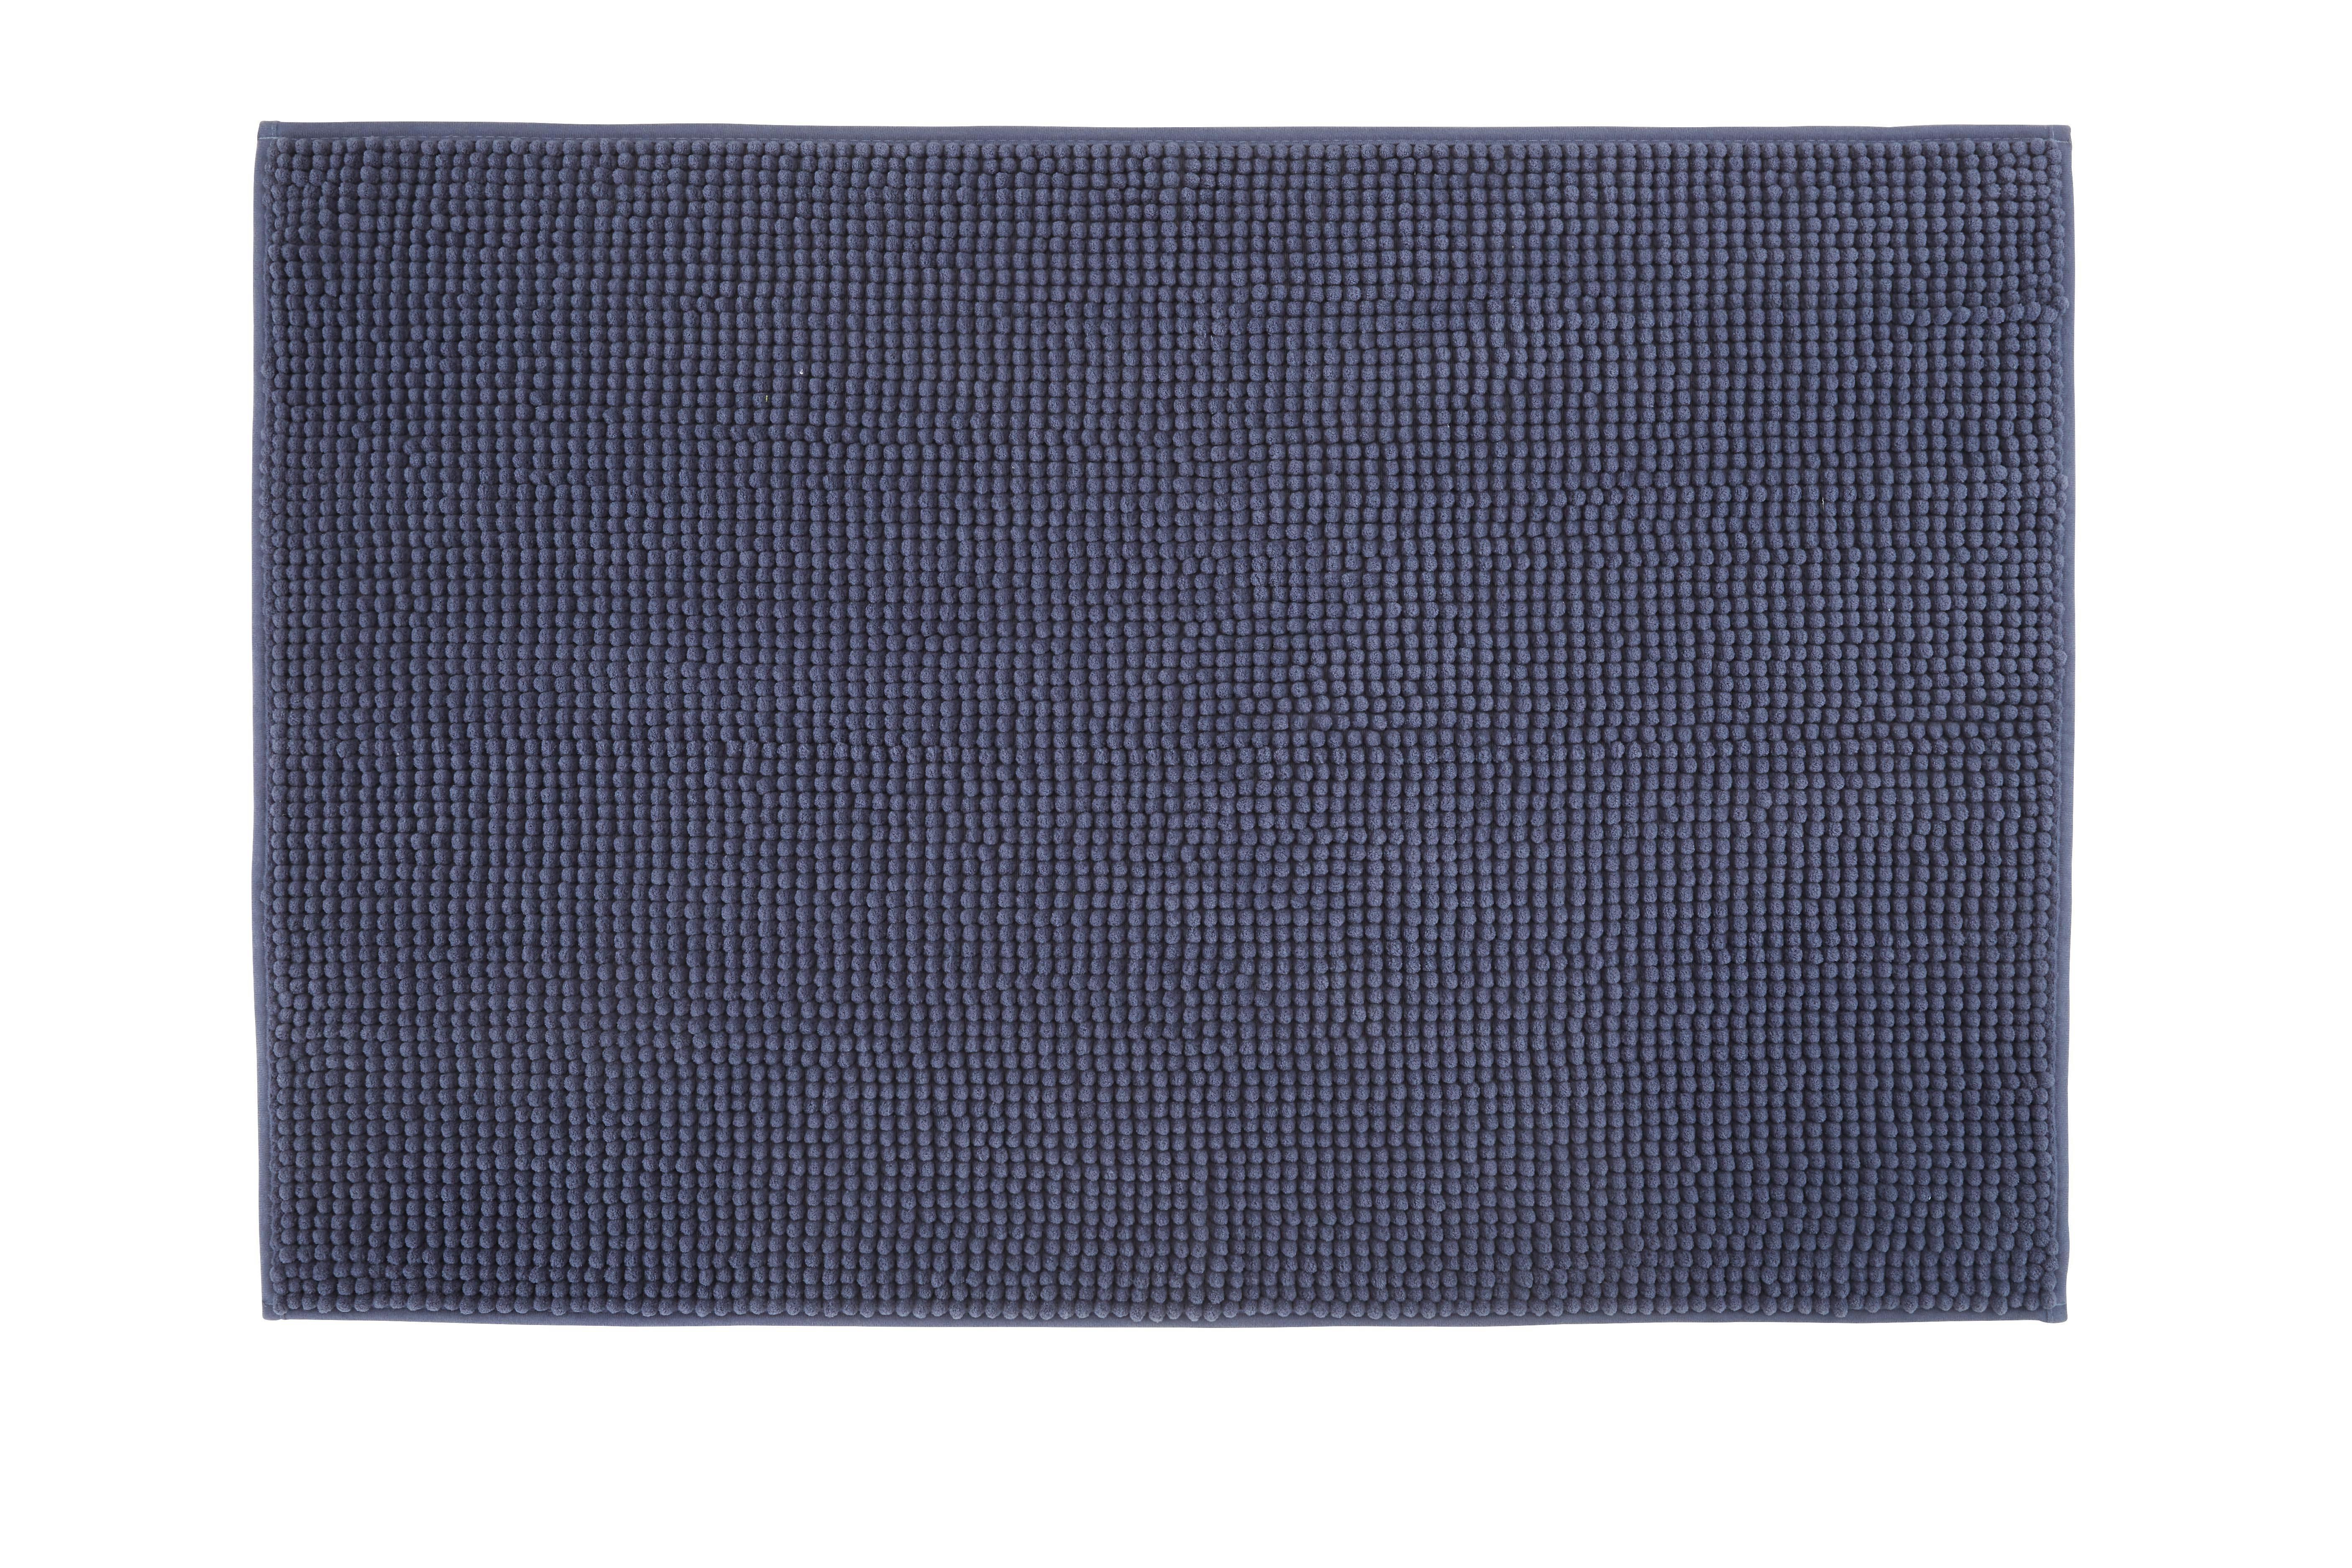 Badematte Nelly ca. 60x90cm - Blau, Textil (60/90cm) - MÖMAX modern living